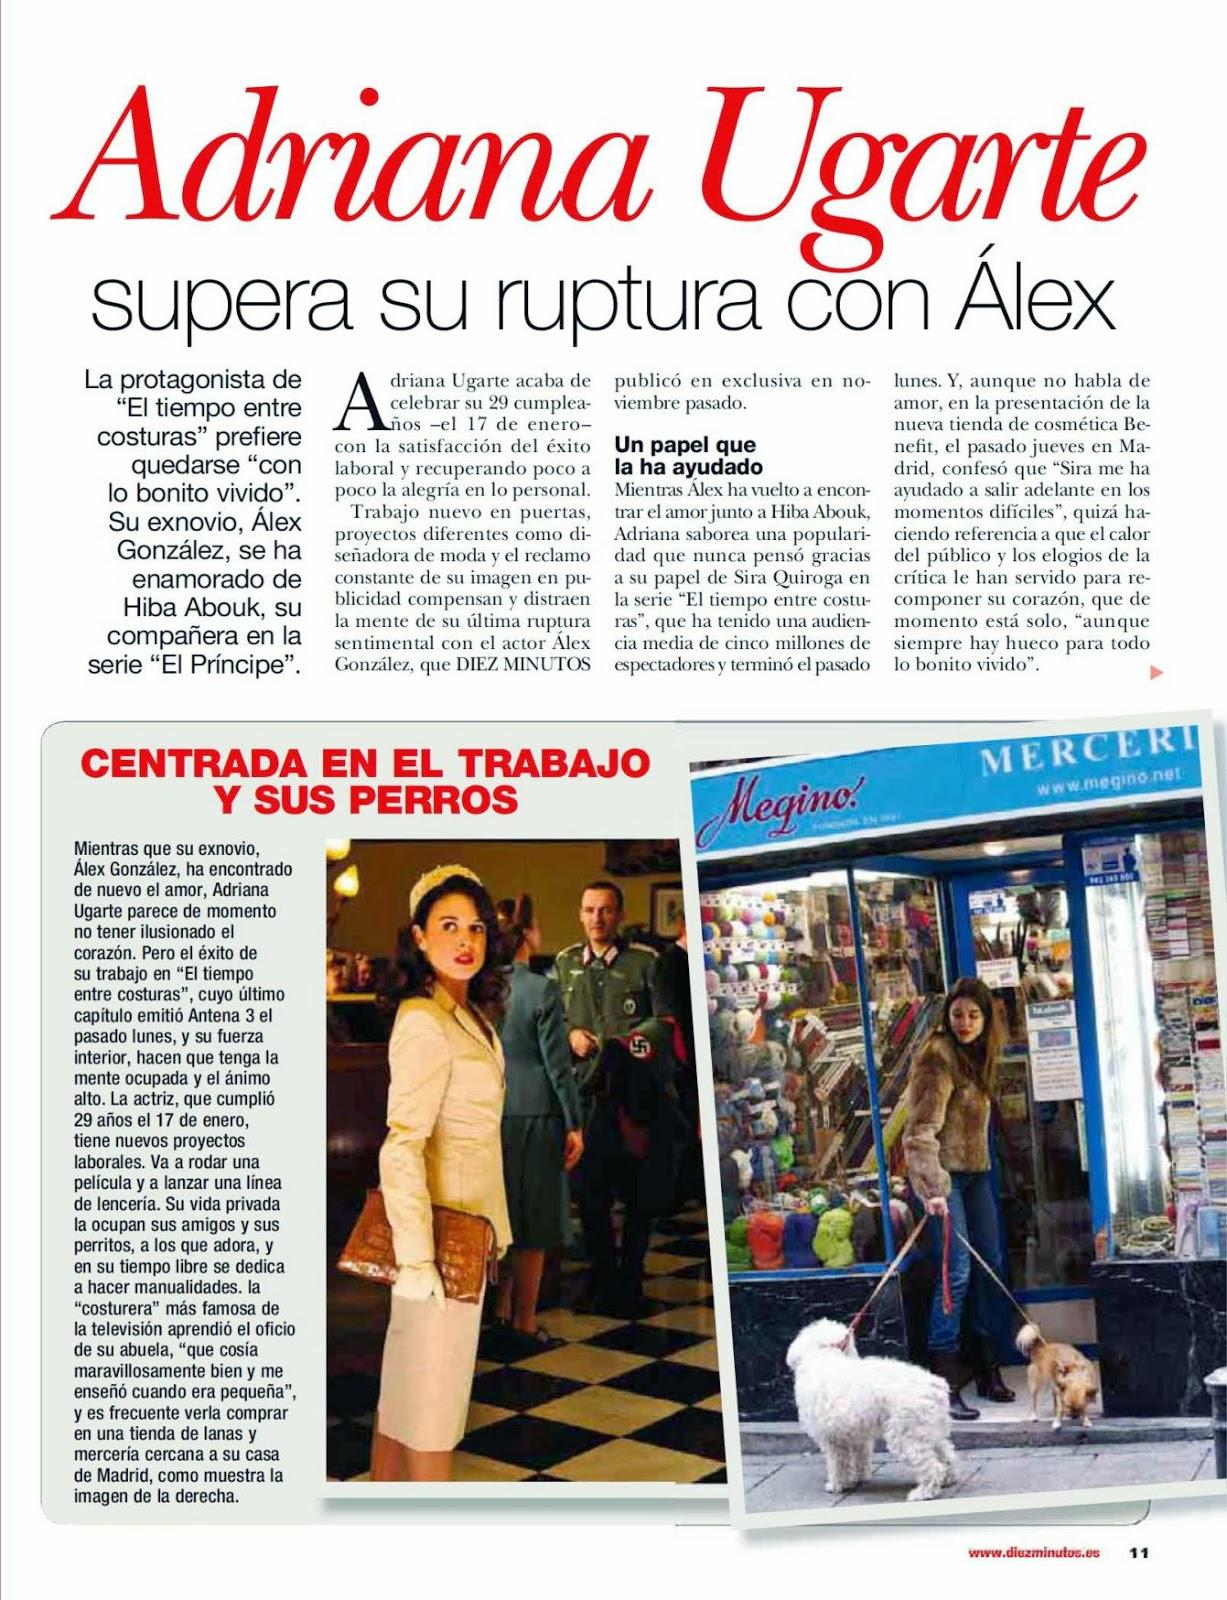 Adriana Ugarte Diez Minutos Spain Magazine Photoshoot January 2014 HQ Pics